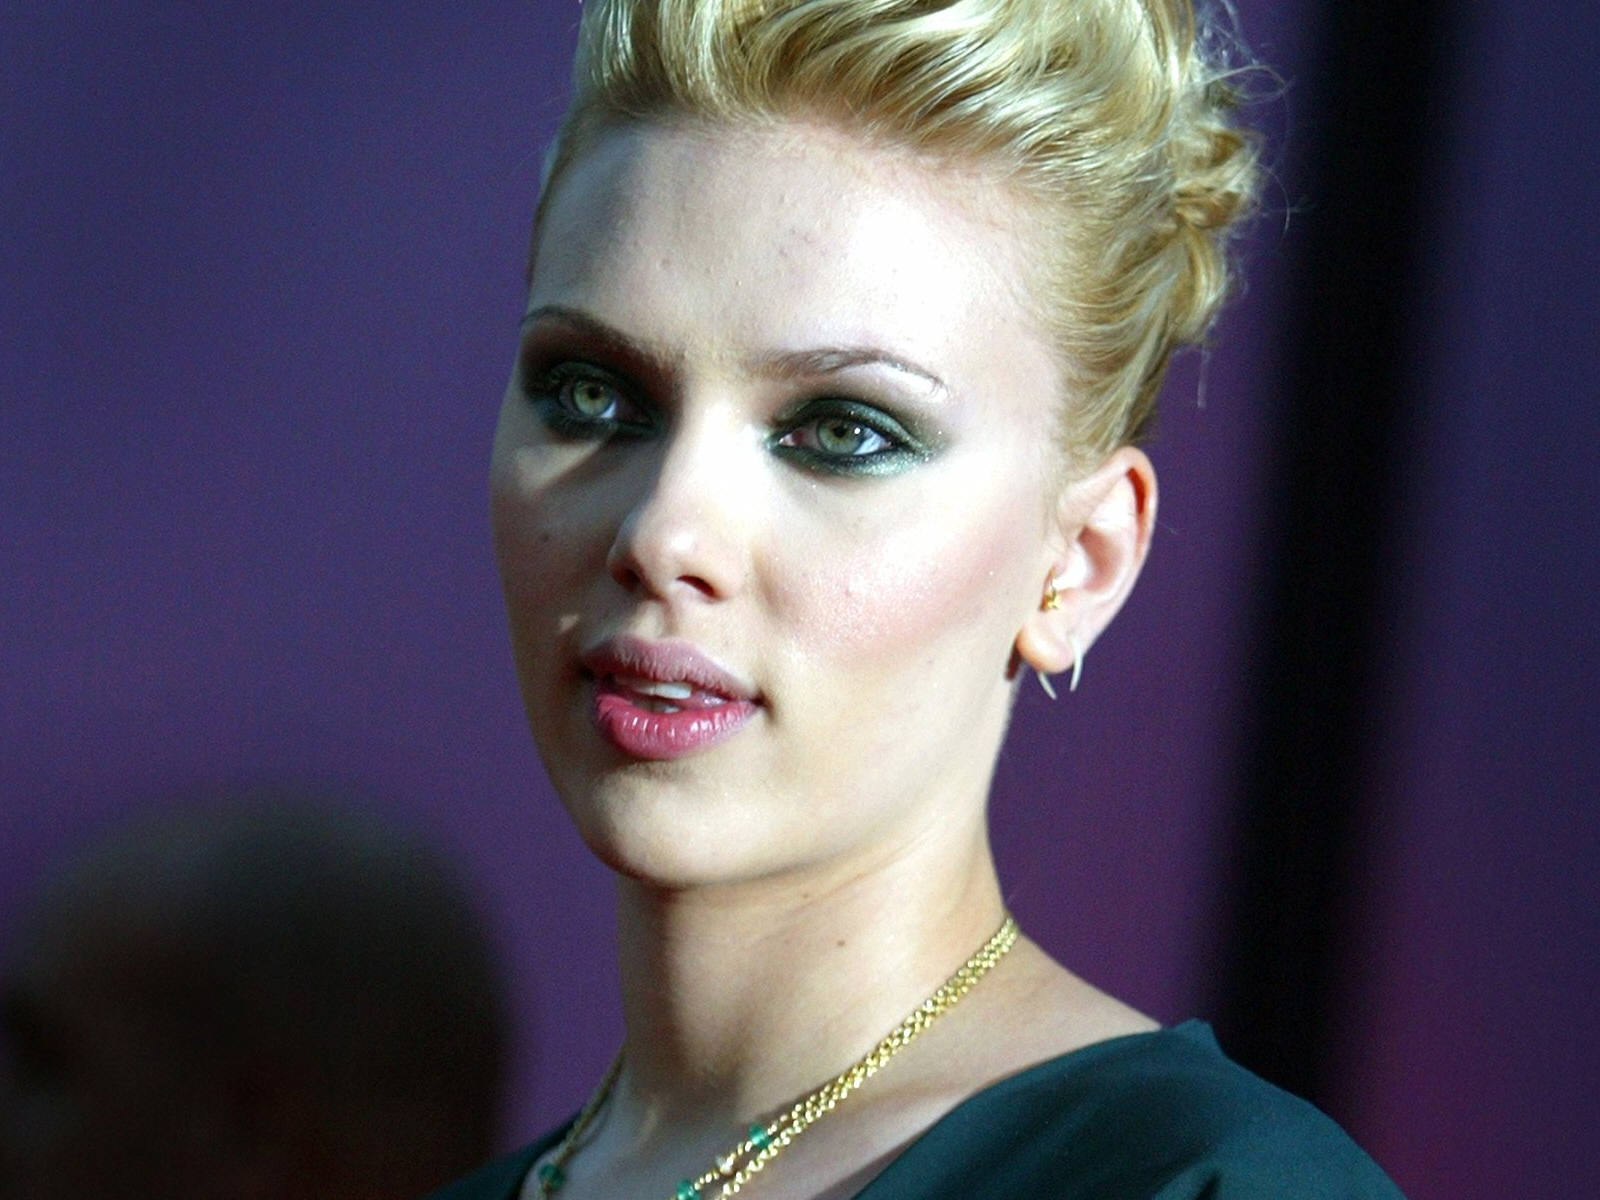 http://4.bp.blogspot.com/-4sIS5SctqLA/Tr0of09Jr3I/AAAAAAAAI9I/GPQGmQ6E_L4/s1600/Scarlett_Johansson_Wallpapers_hot_lips.jpg